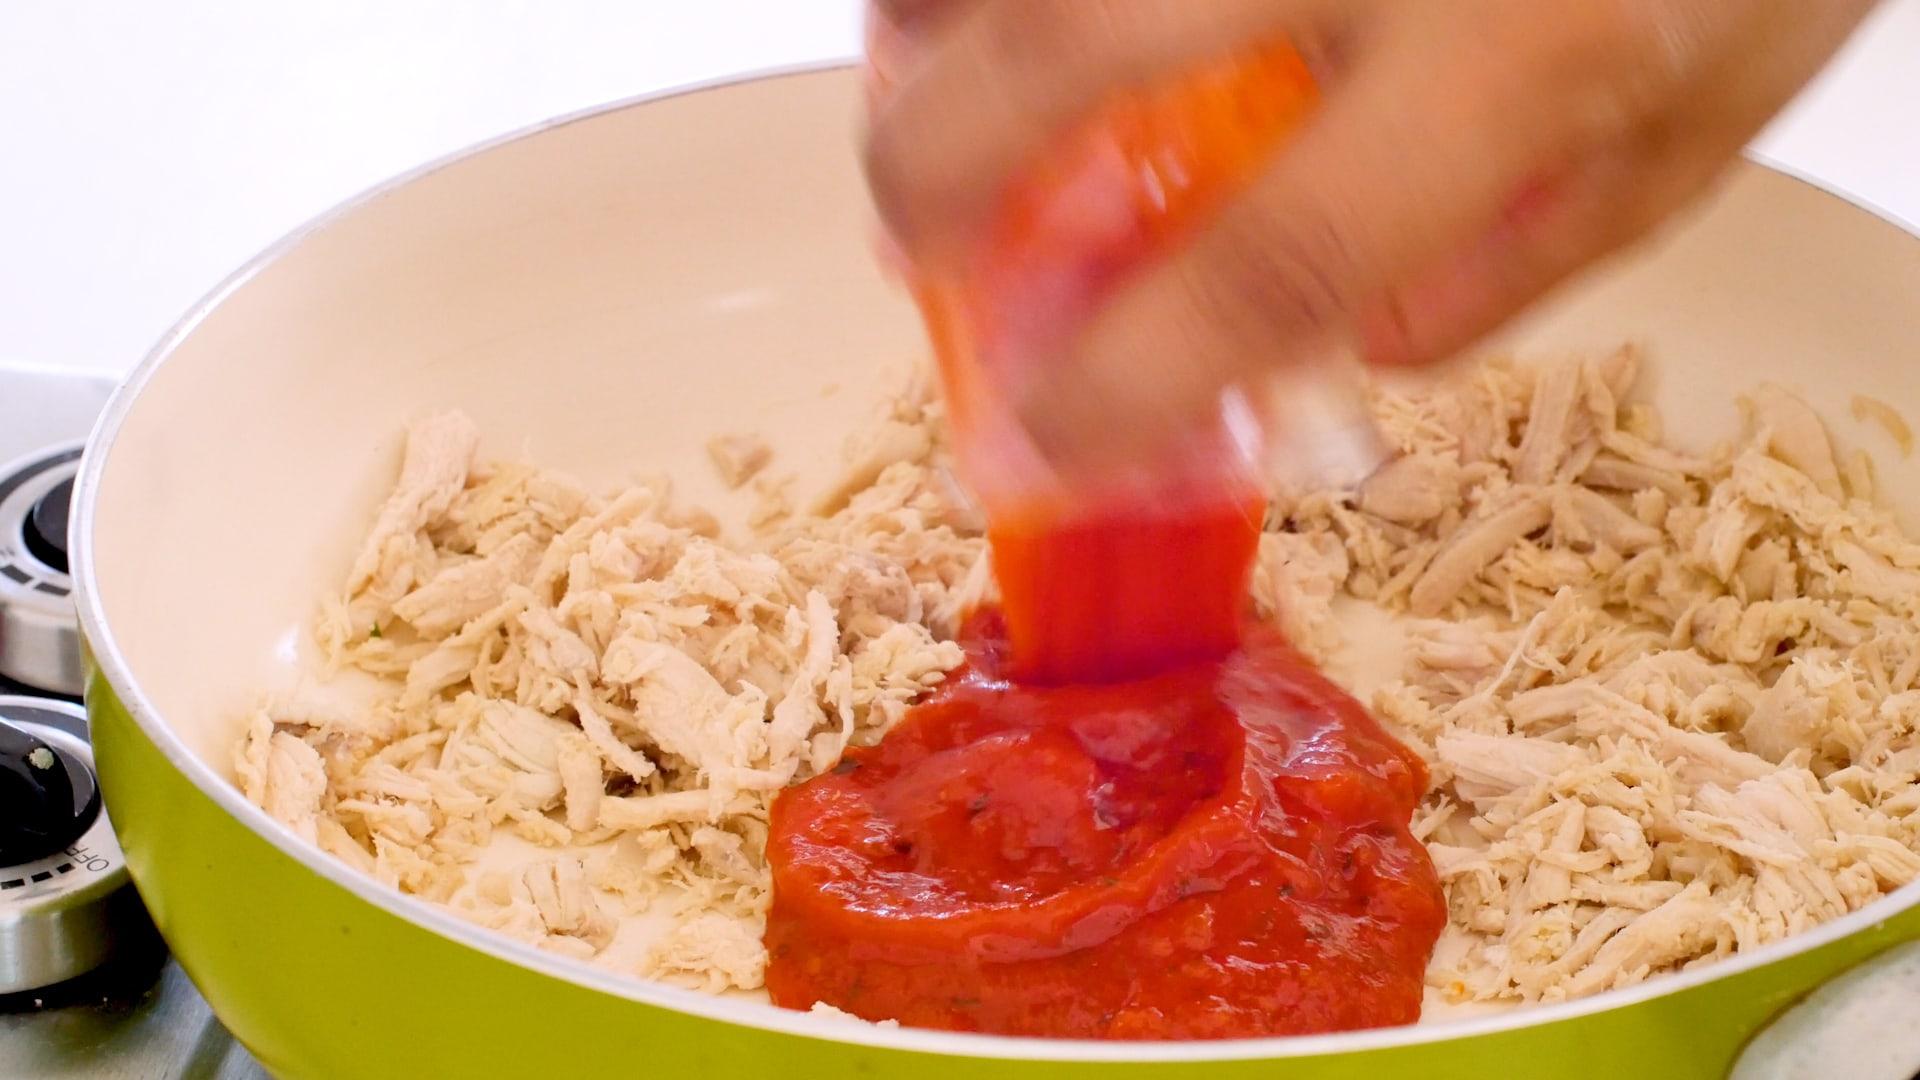 Adding tomato sauce to chicken